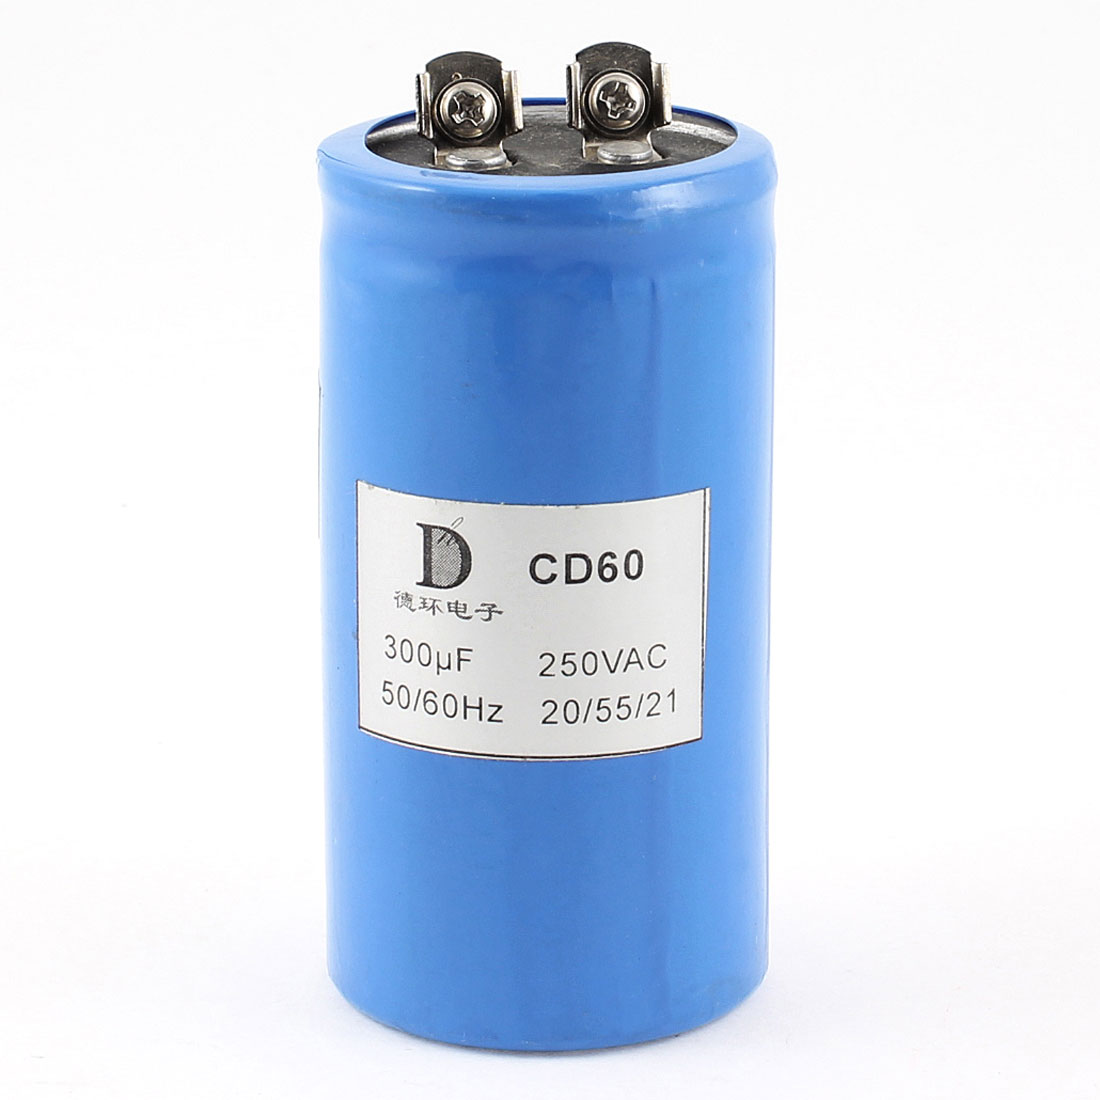 AC 250V 300uF Non Polar Cylindrical Motor Start Capacitor Blue